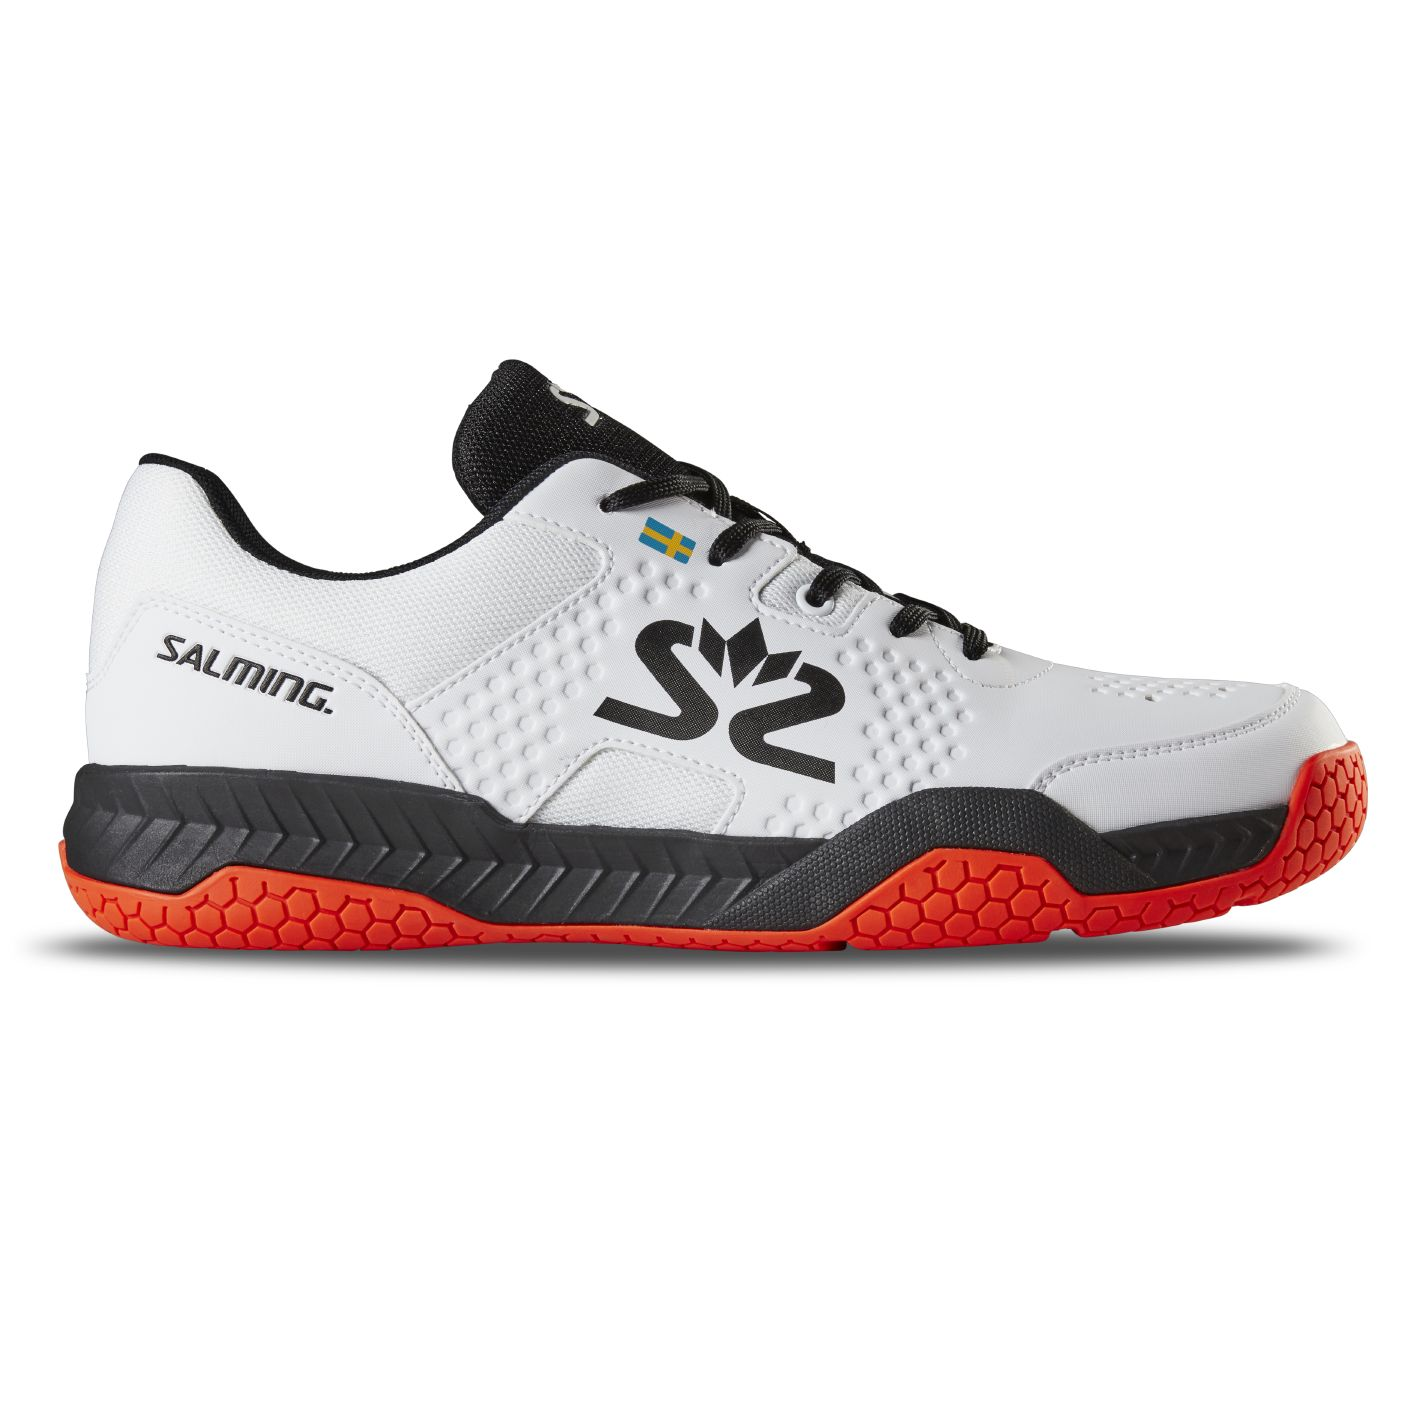 Salming Hawk Court Shoe Men White/Black 7,5 UK - 42 EUR - 26,5 cm